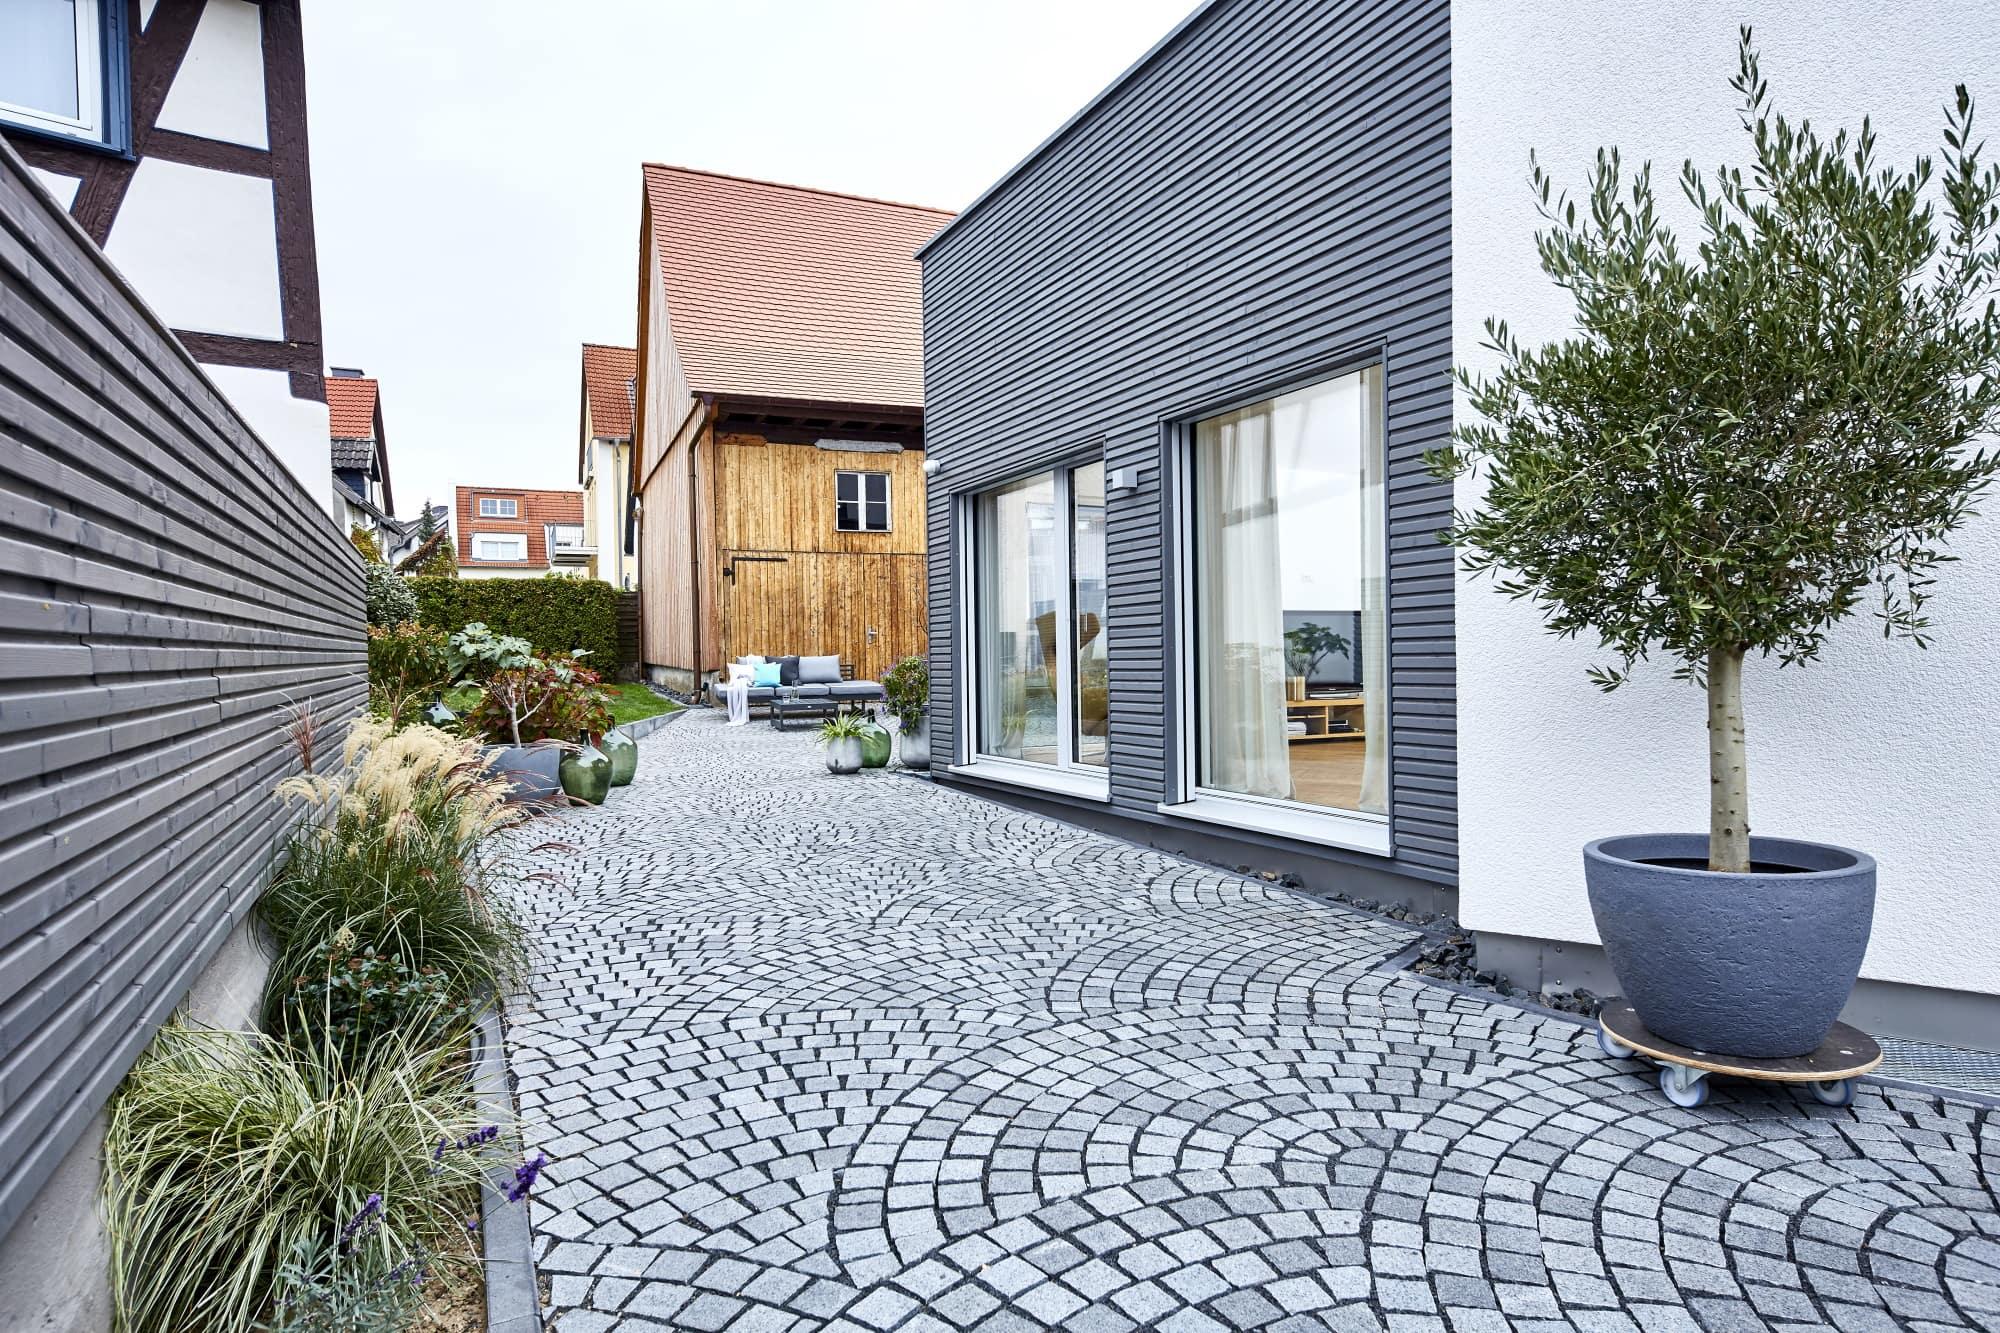 Moderner Erker Anbau mit Holz Fassade & Innenhof gepflastert - Fertighaus bauen Ideen ökologisches Baufritz Haus STADTHAUS EHRMANN - HausbauDirekt.de